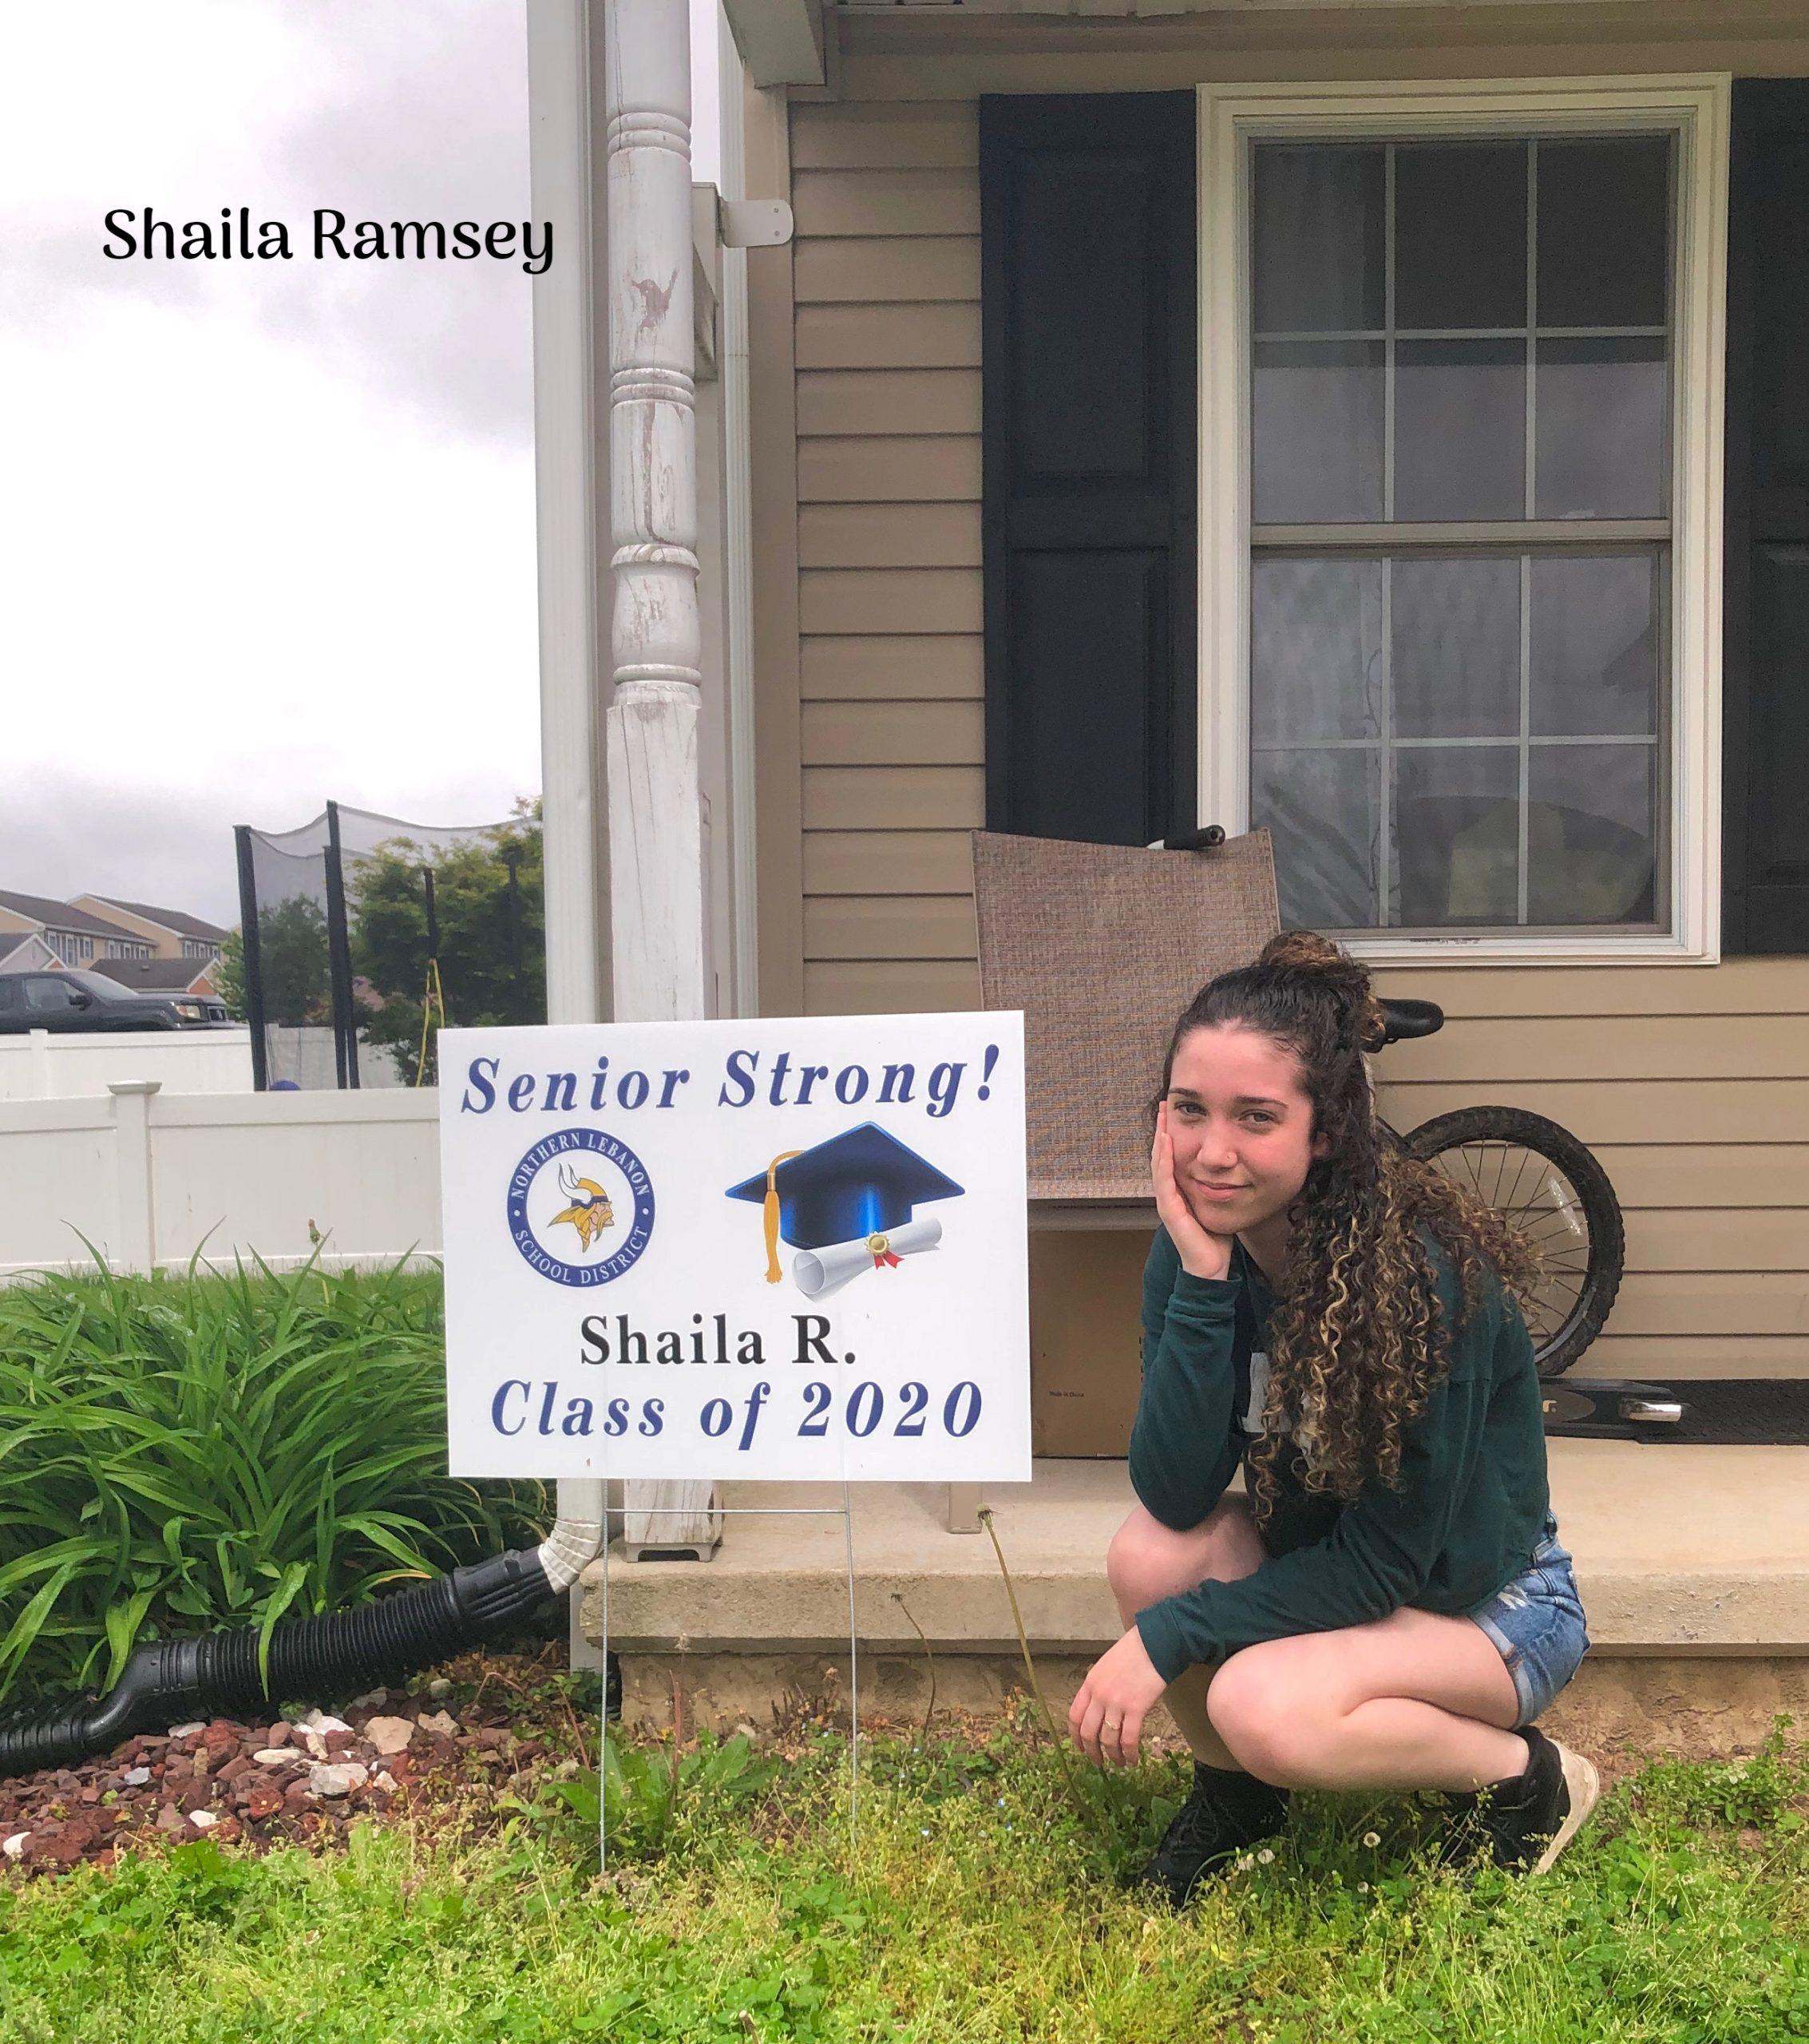 Shaila Ramsey